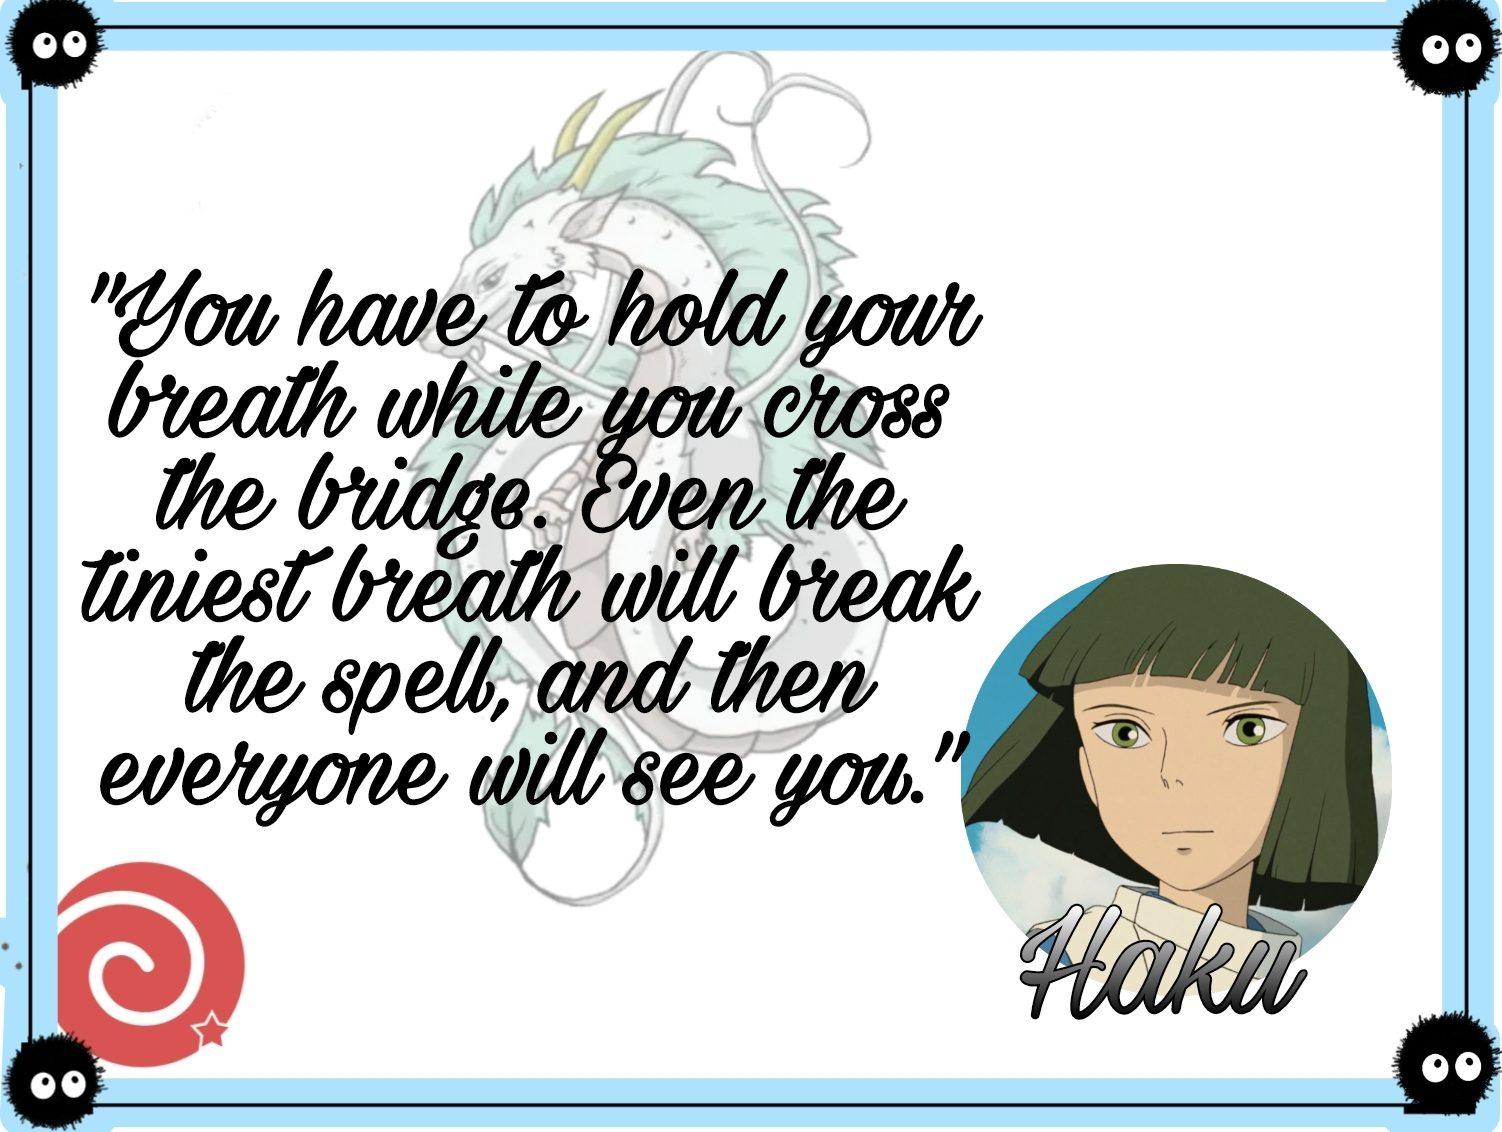 Quotes by Haku